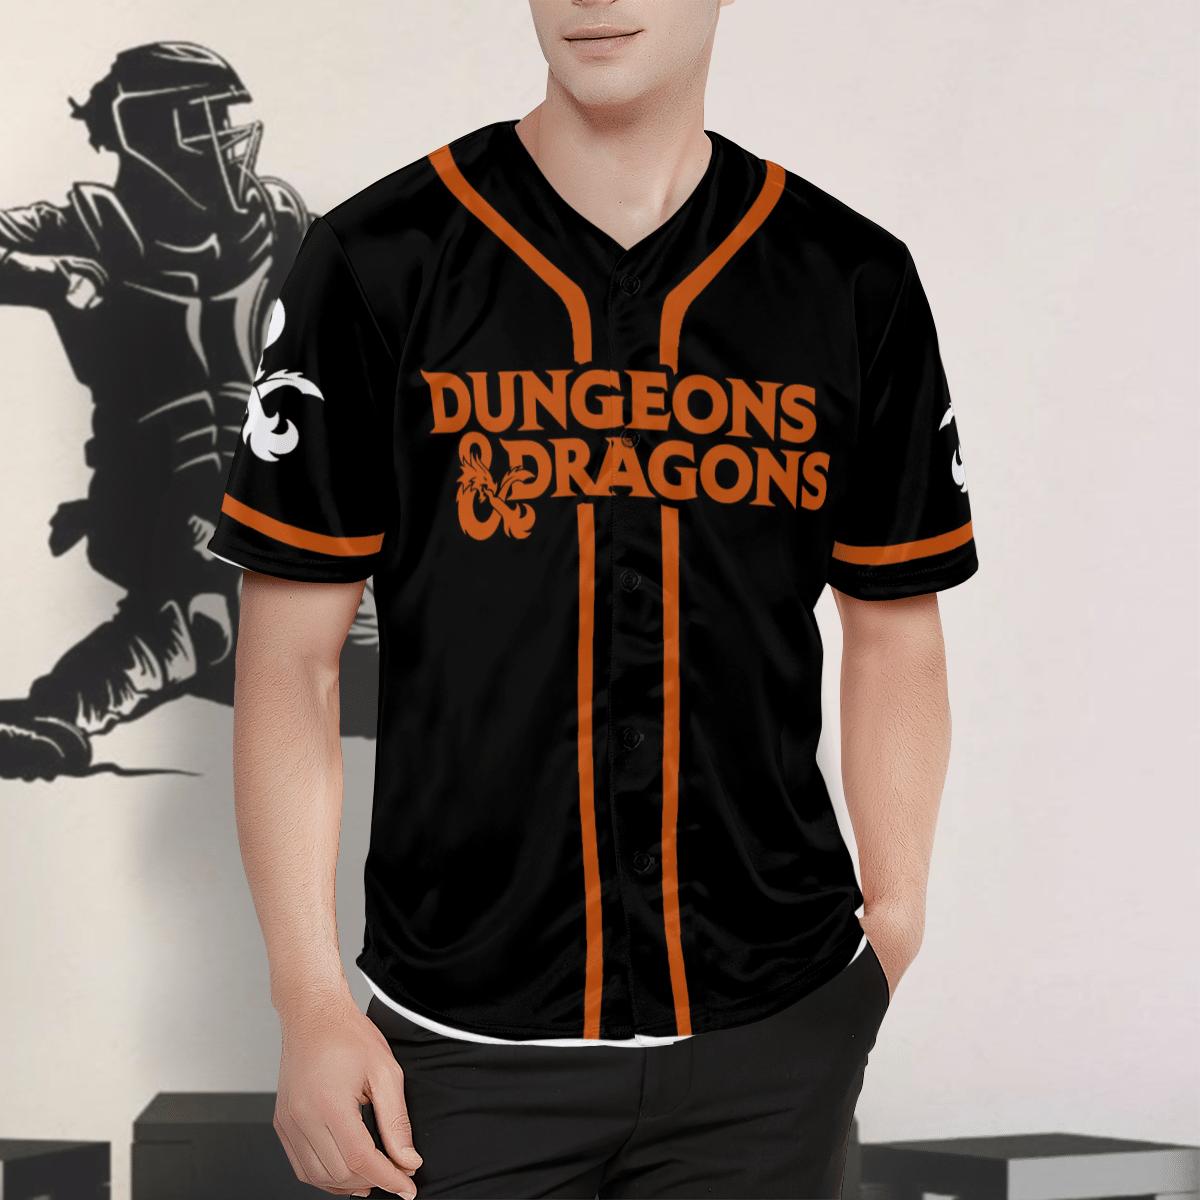 Dungeons Dragons Game Hawaiian Shirt Button Up Shirt